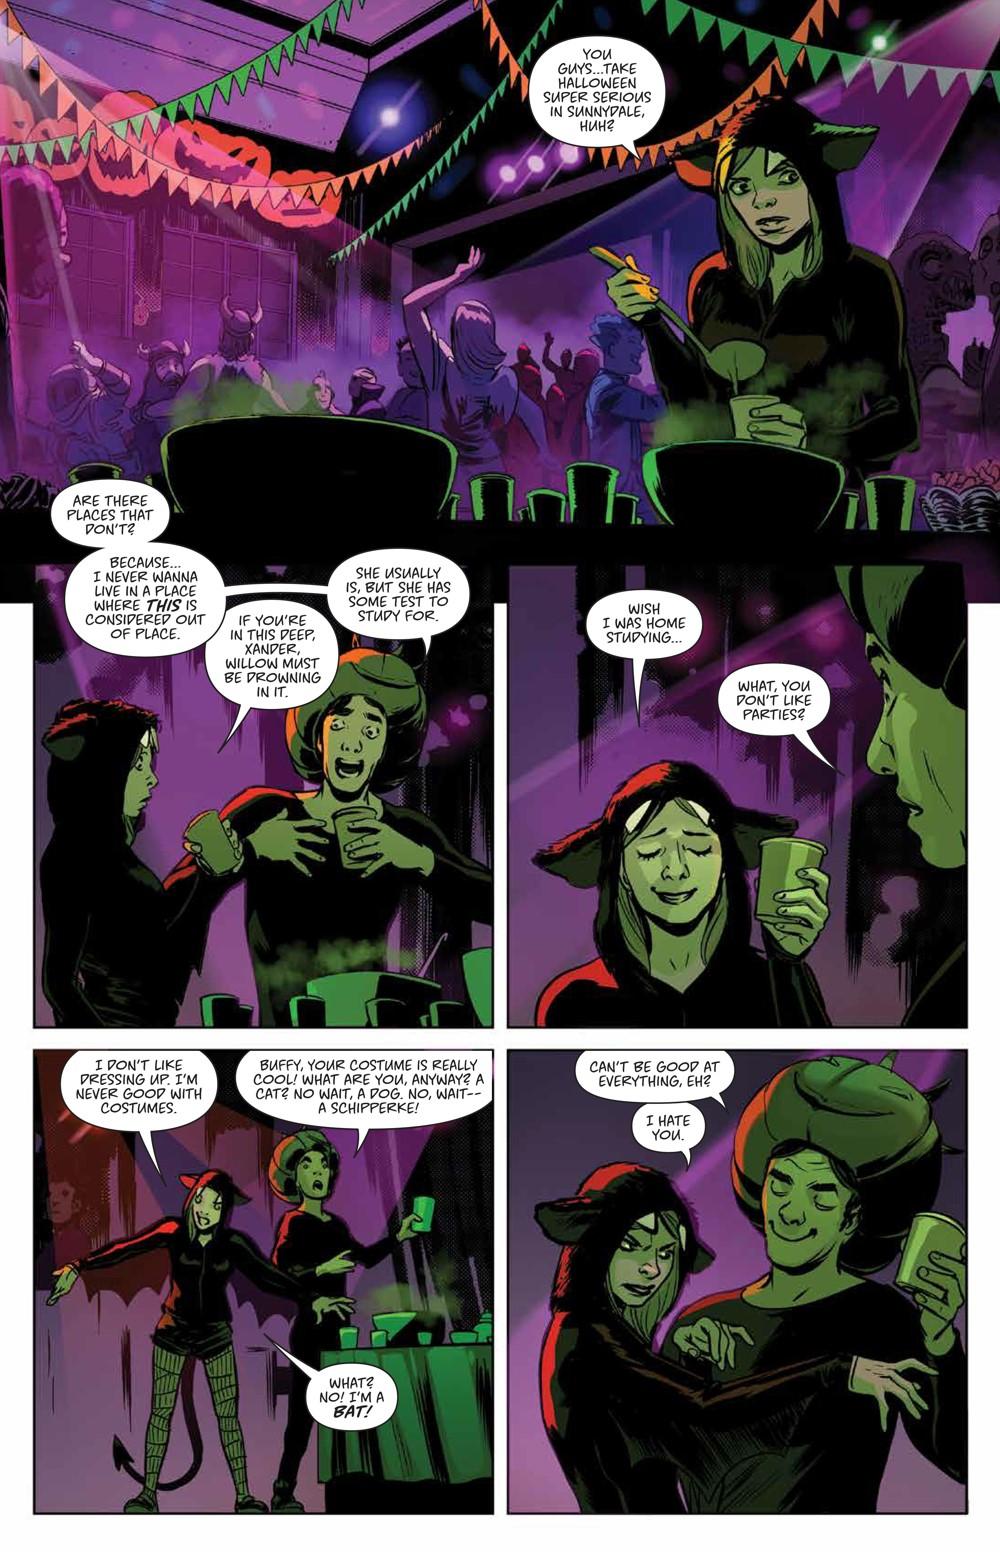 Buffy_Deluxe_v2_Hellmouth_HC_PRESS_11 ComicList Previews: BUFFY THE VAMPIRE SLAYER HELLMOUTH DELUXE EDITION HC